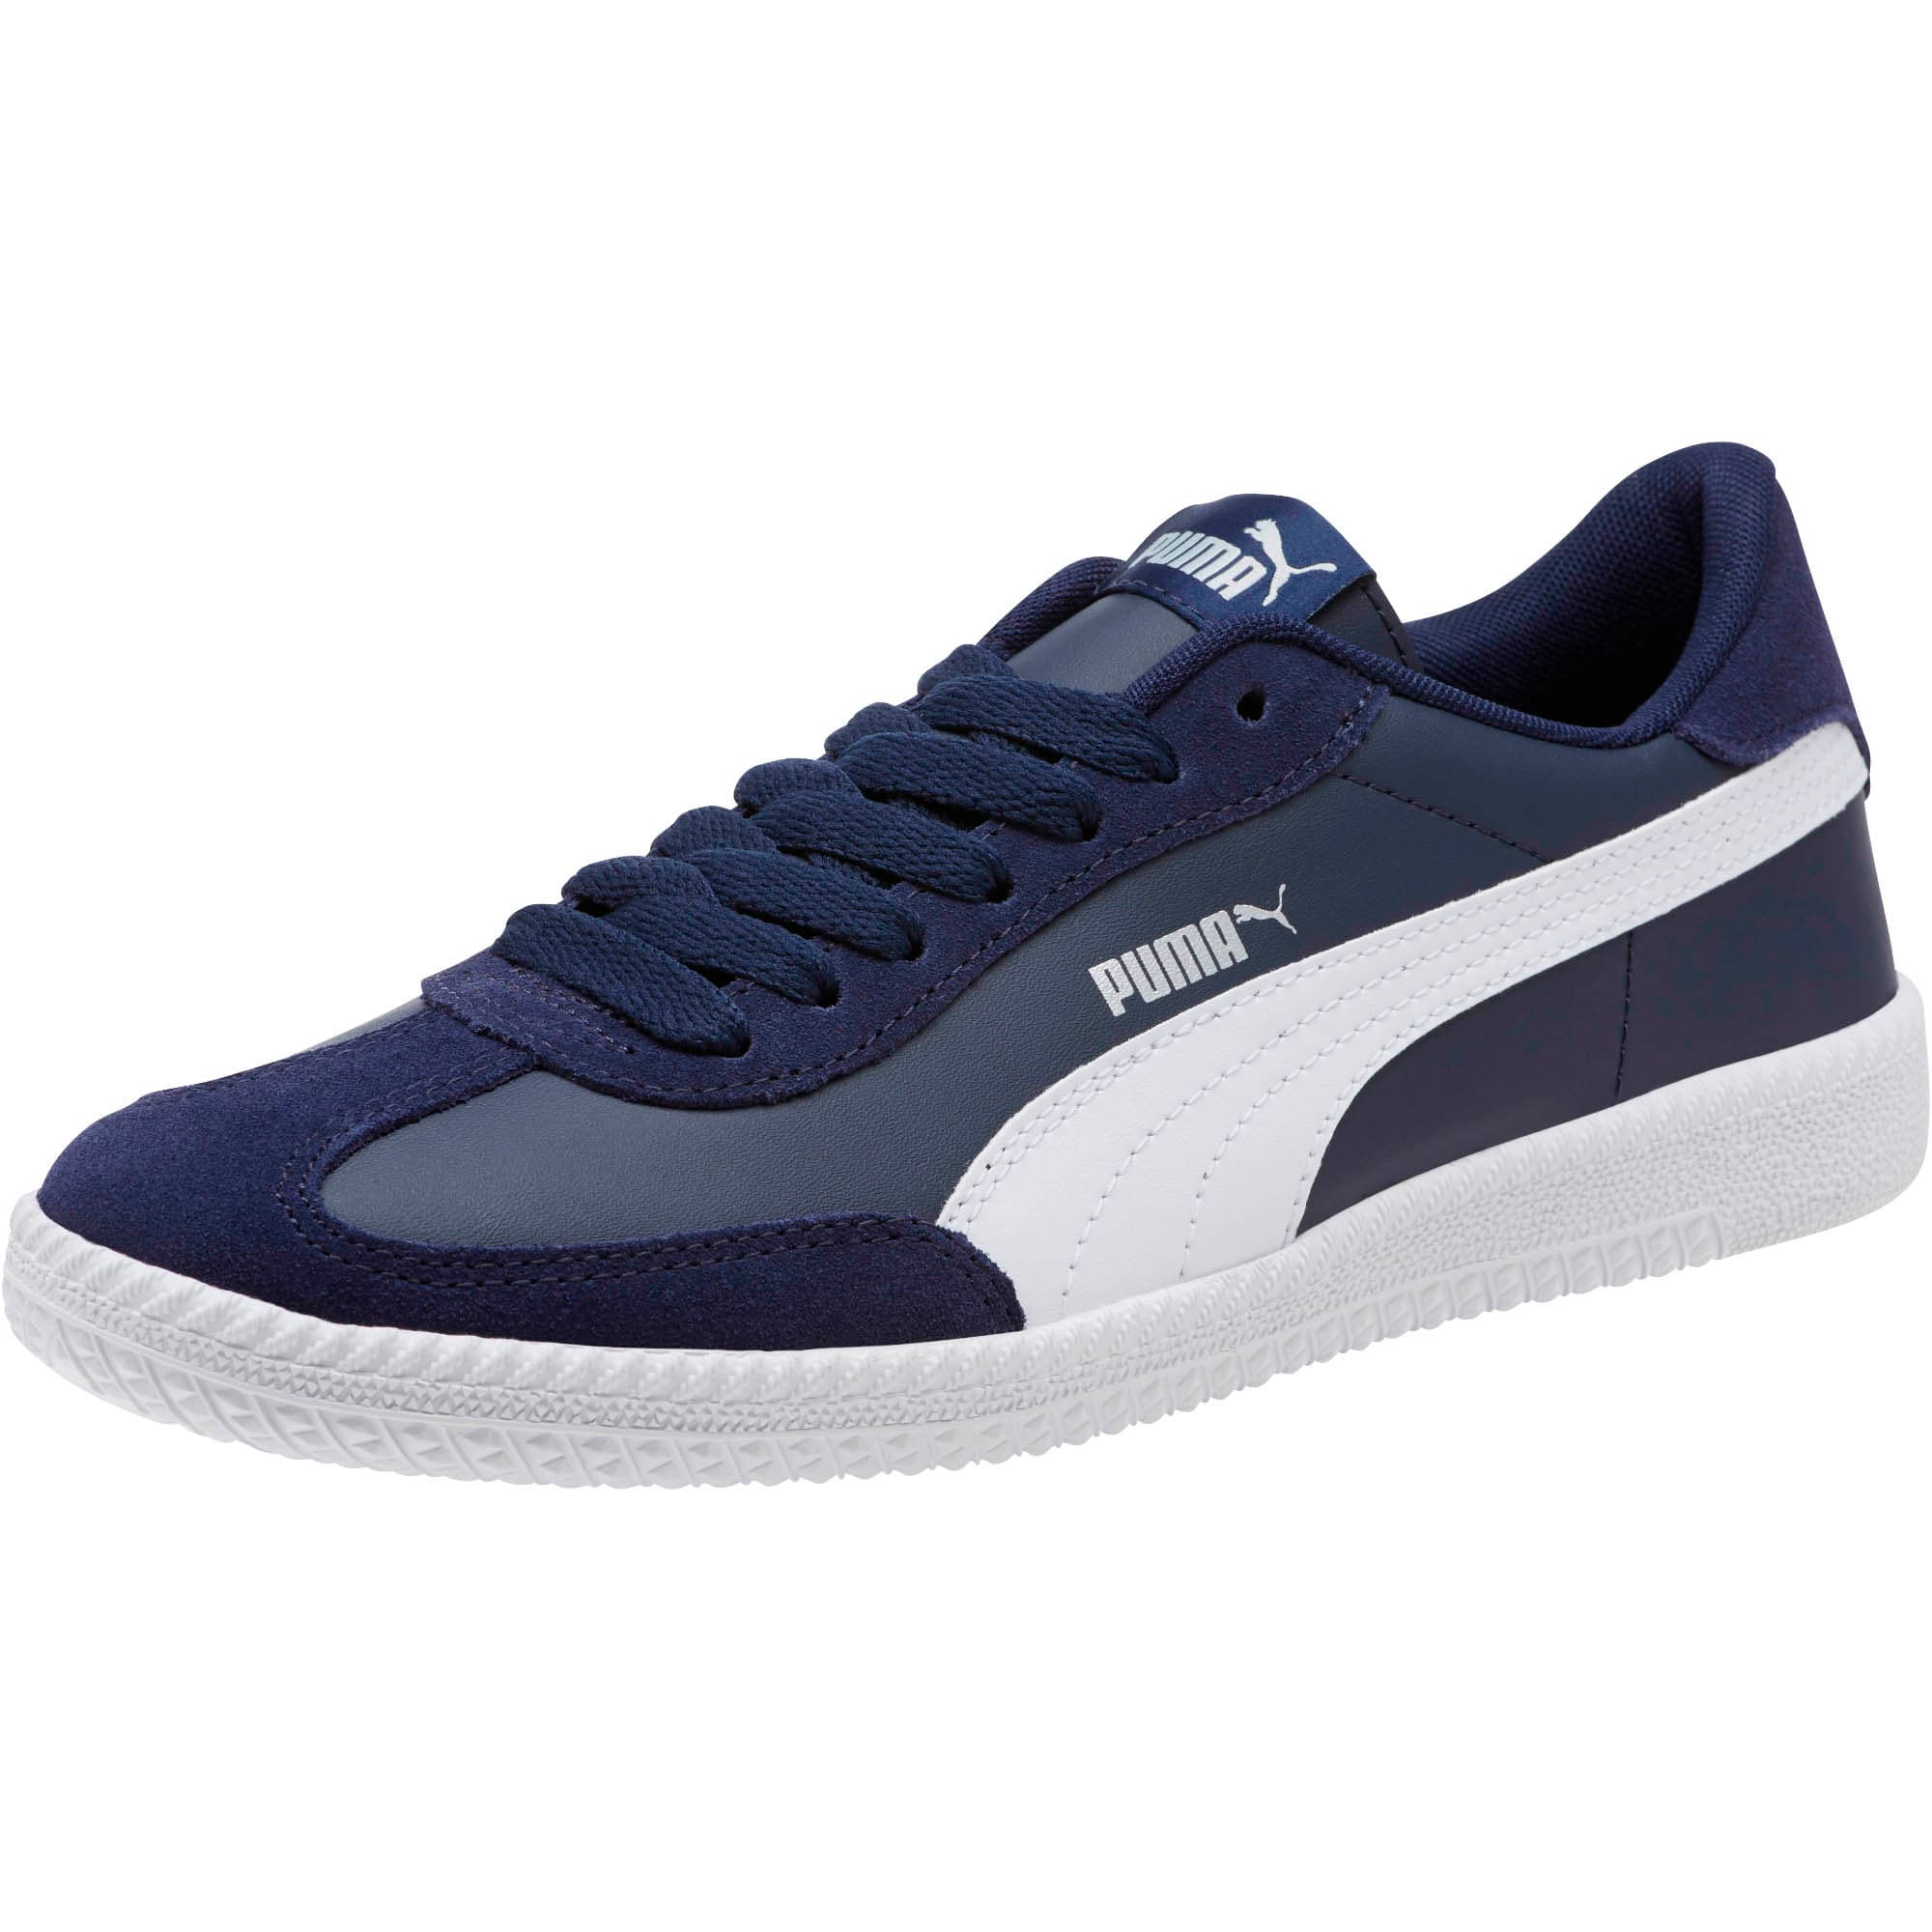 Thumbnail 1 of Astro Cup Sneakers, Peacoat-Puma White, medium